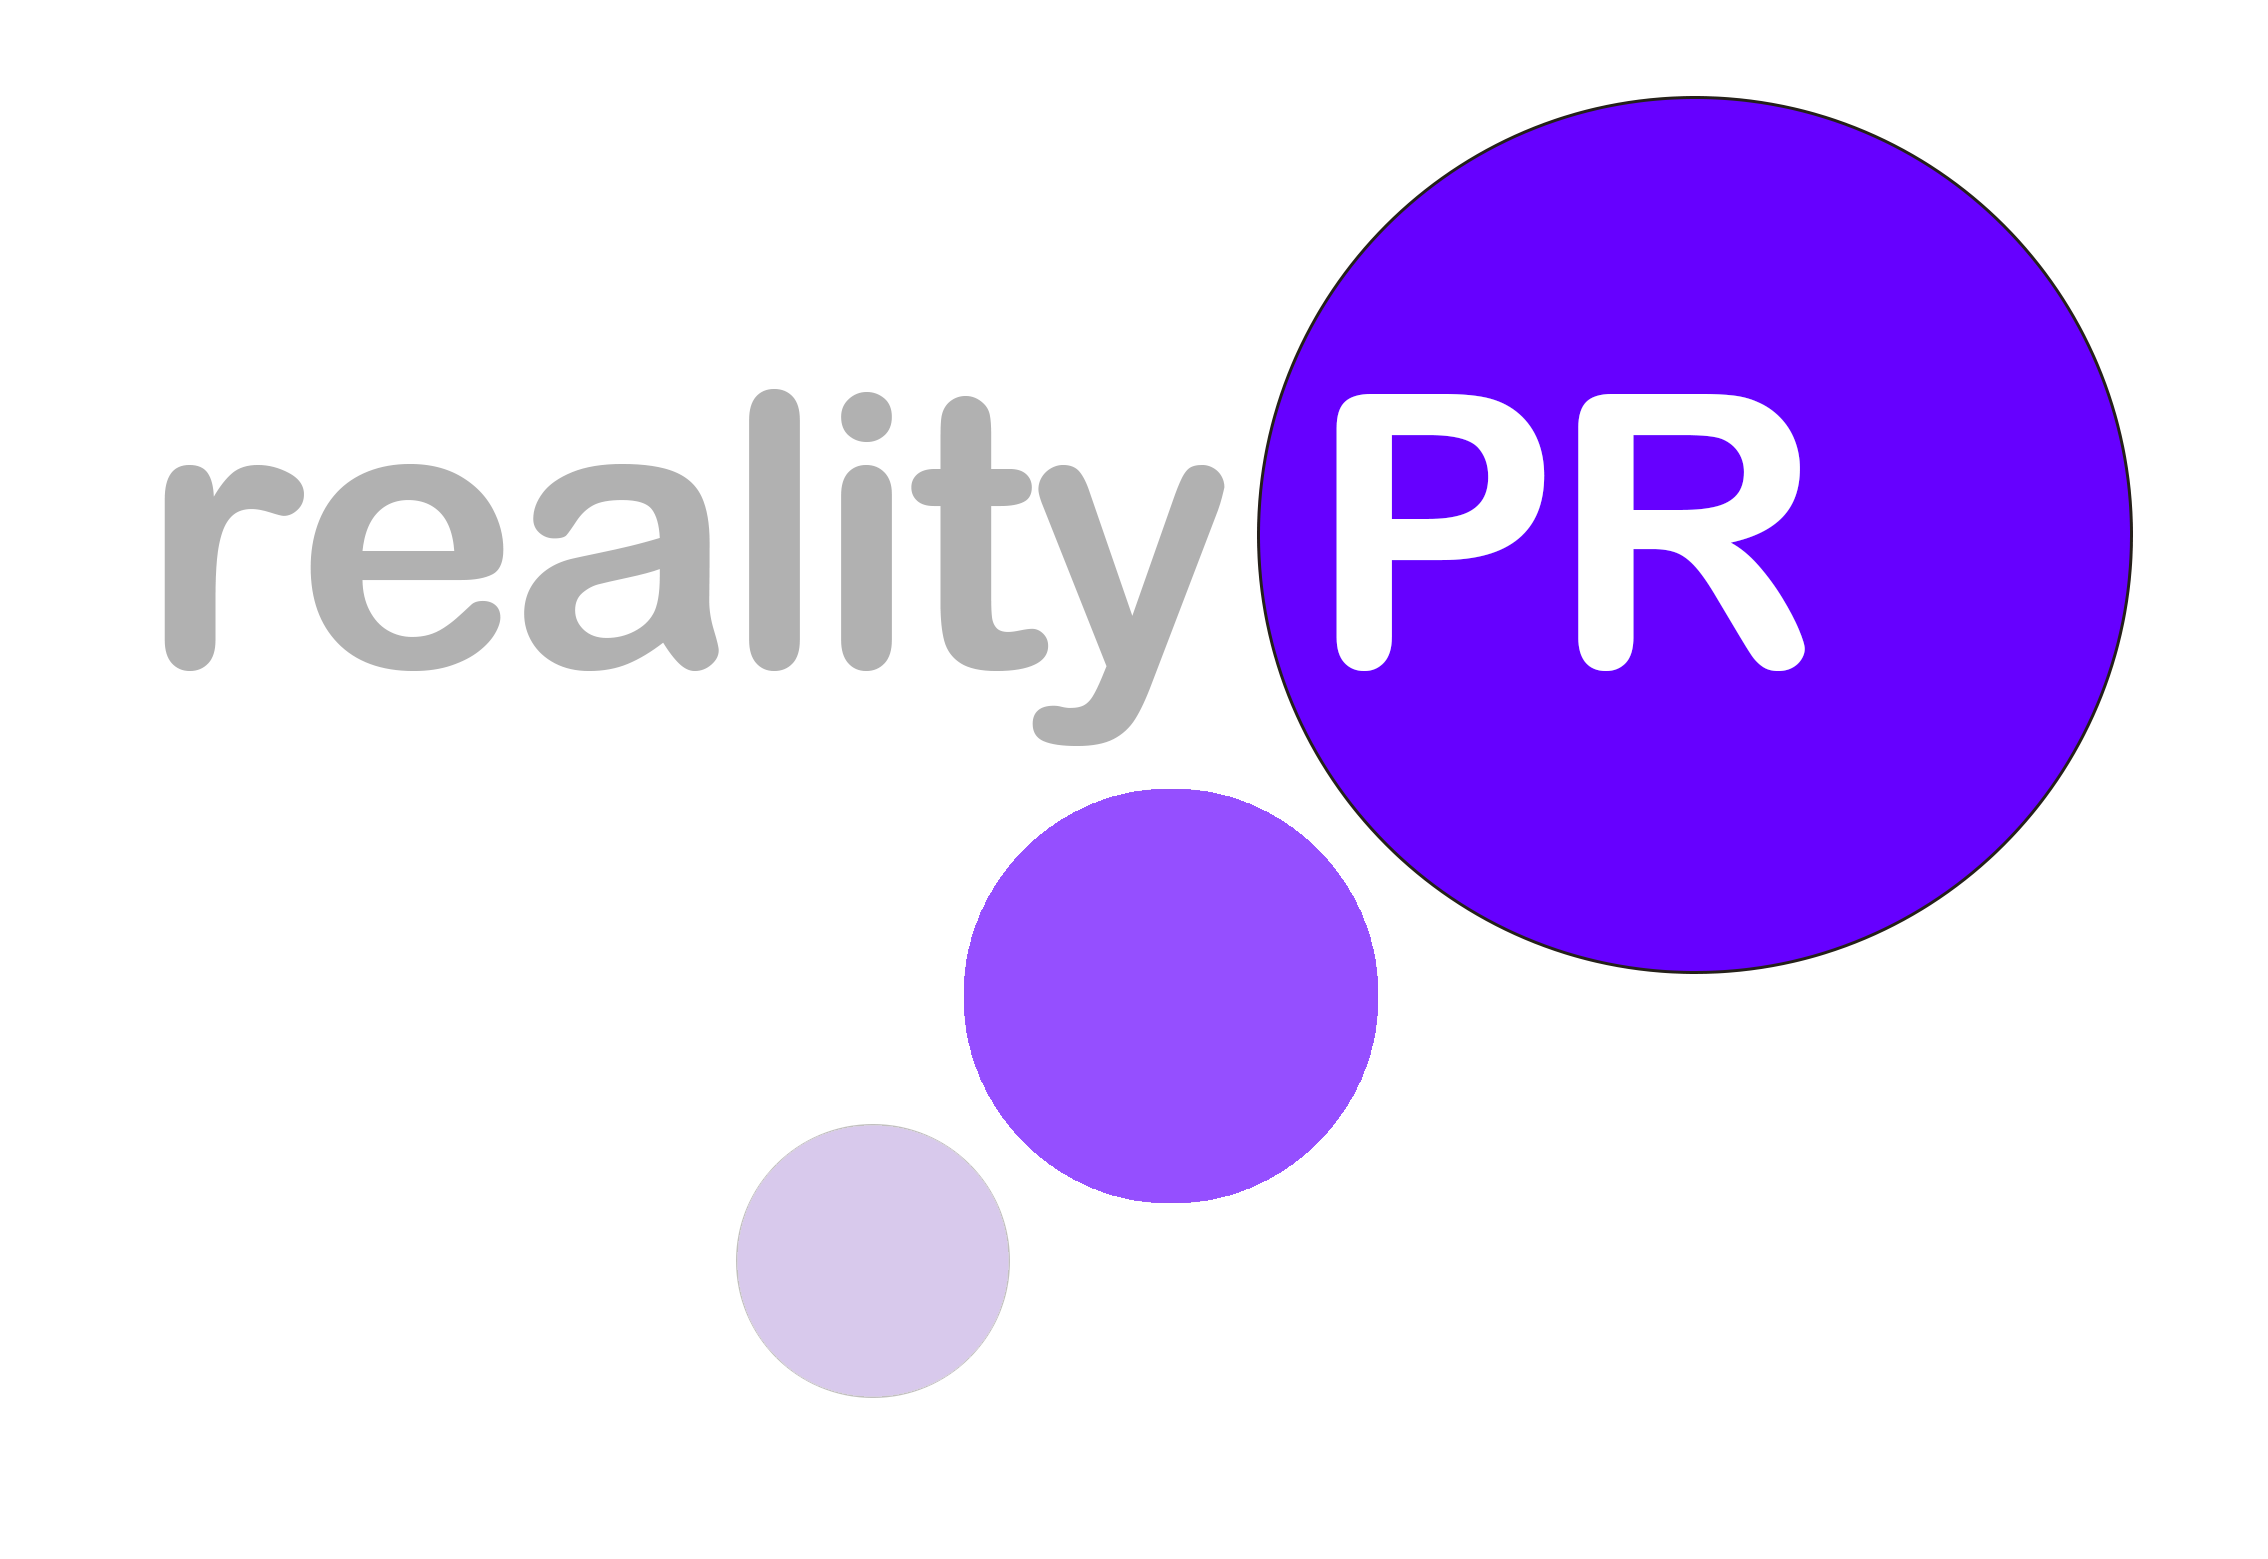 Realitypr